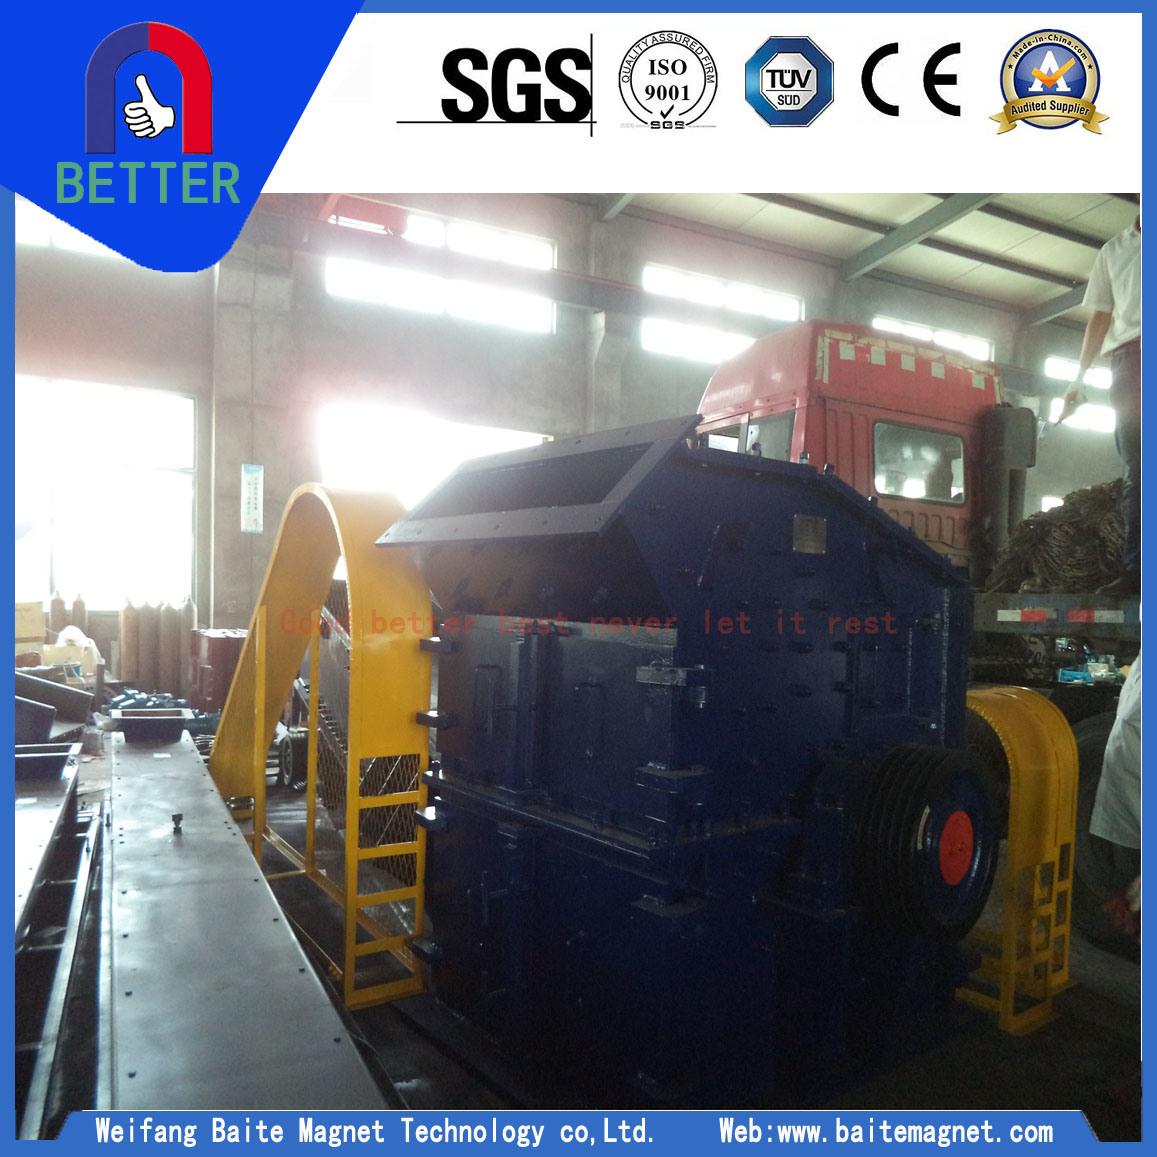 Px Series New Type Stone/ Mining/Mineral /Fine Crusher for Mining/Metallurgy/Buliding Materials/Sand/Ceramics